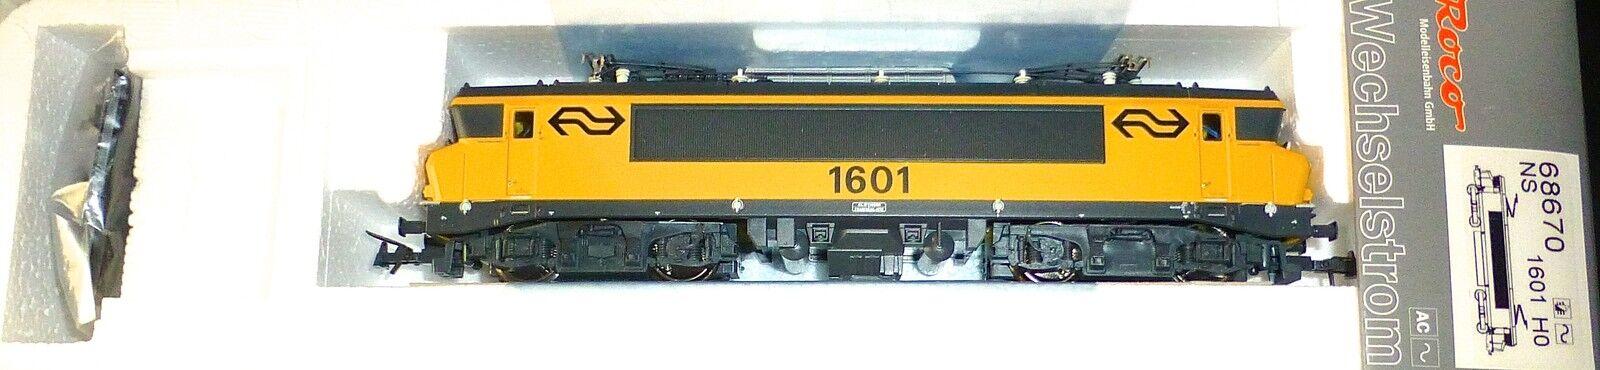 NS Series 1600 E-Locomotive for Märklin Ac Digital Roco 68670 Ovp H0 1 87 Hi2 Μ